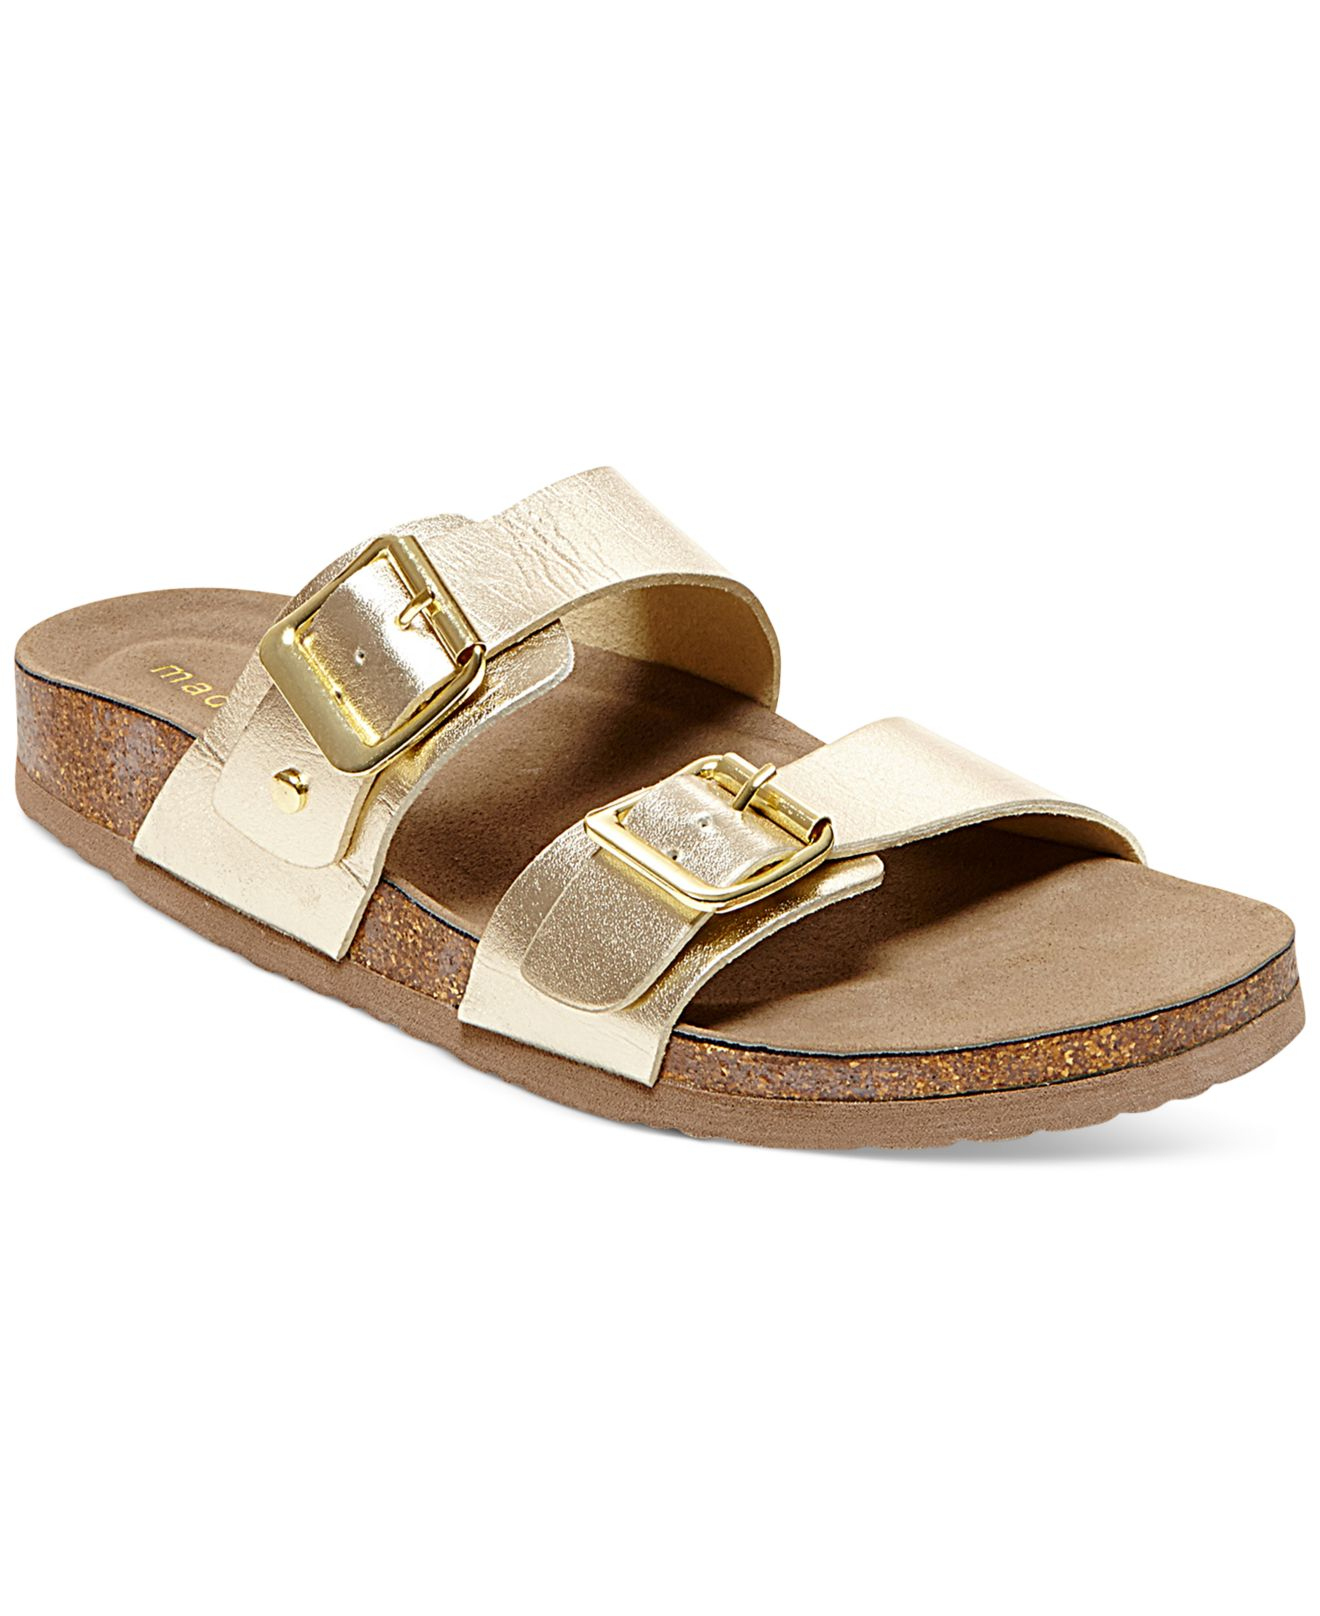 6dfa5aab652f Madden Girl Brando Footbed Sandals in Metallic - Lyst